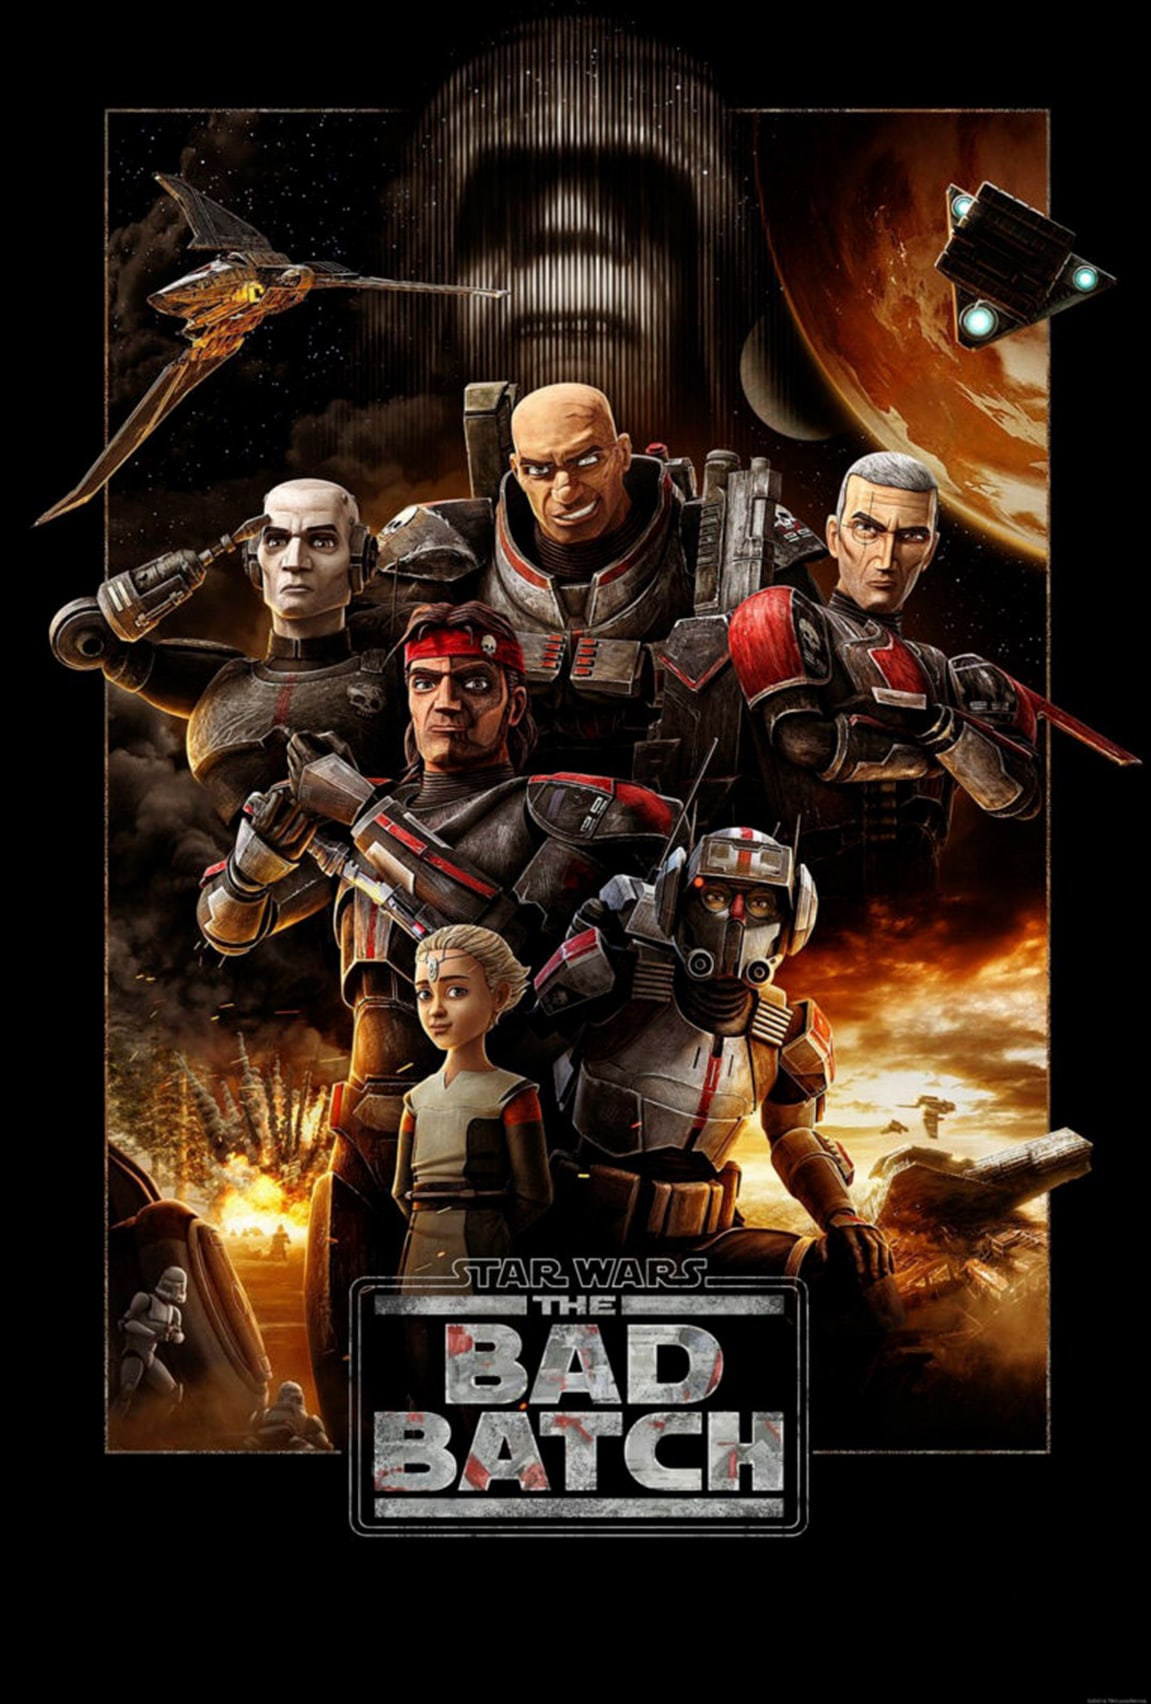 Star Wars: The Bad Batch on Disney Plus